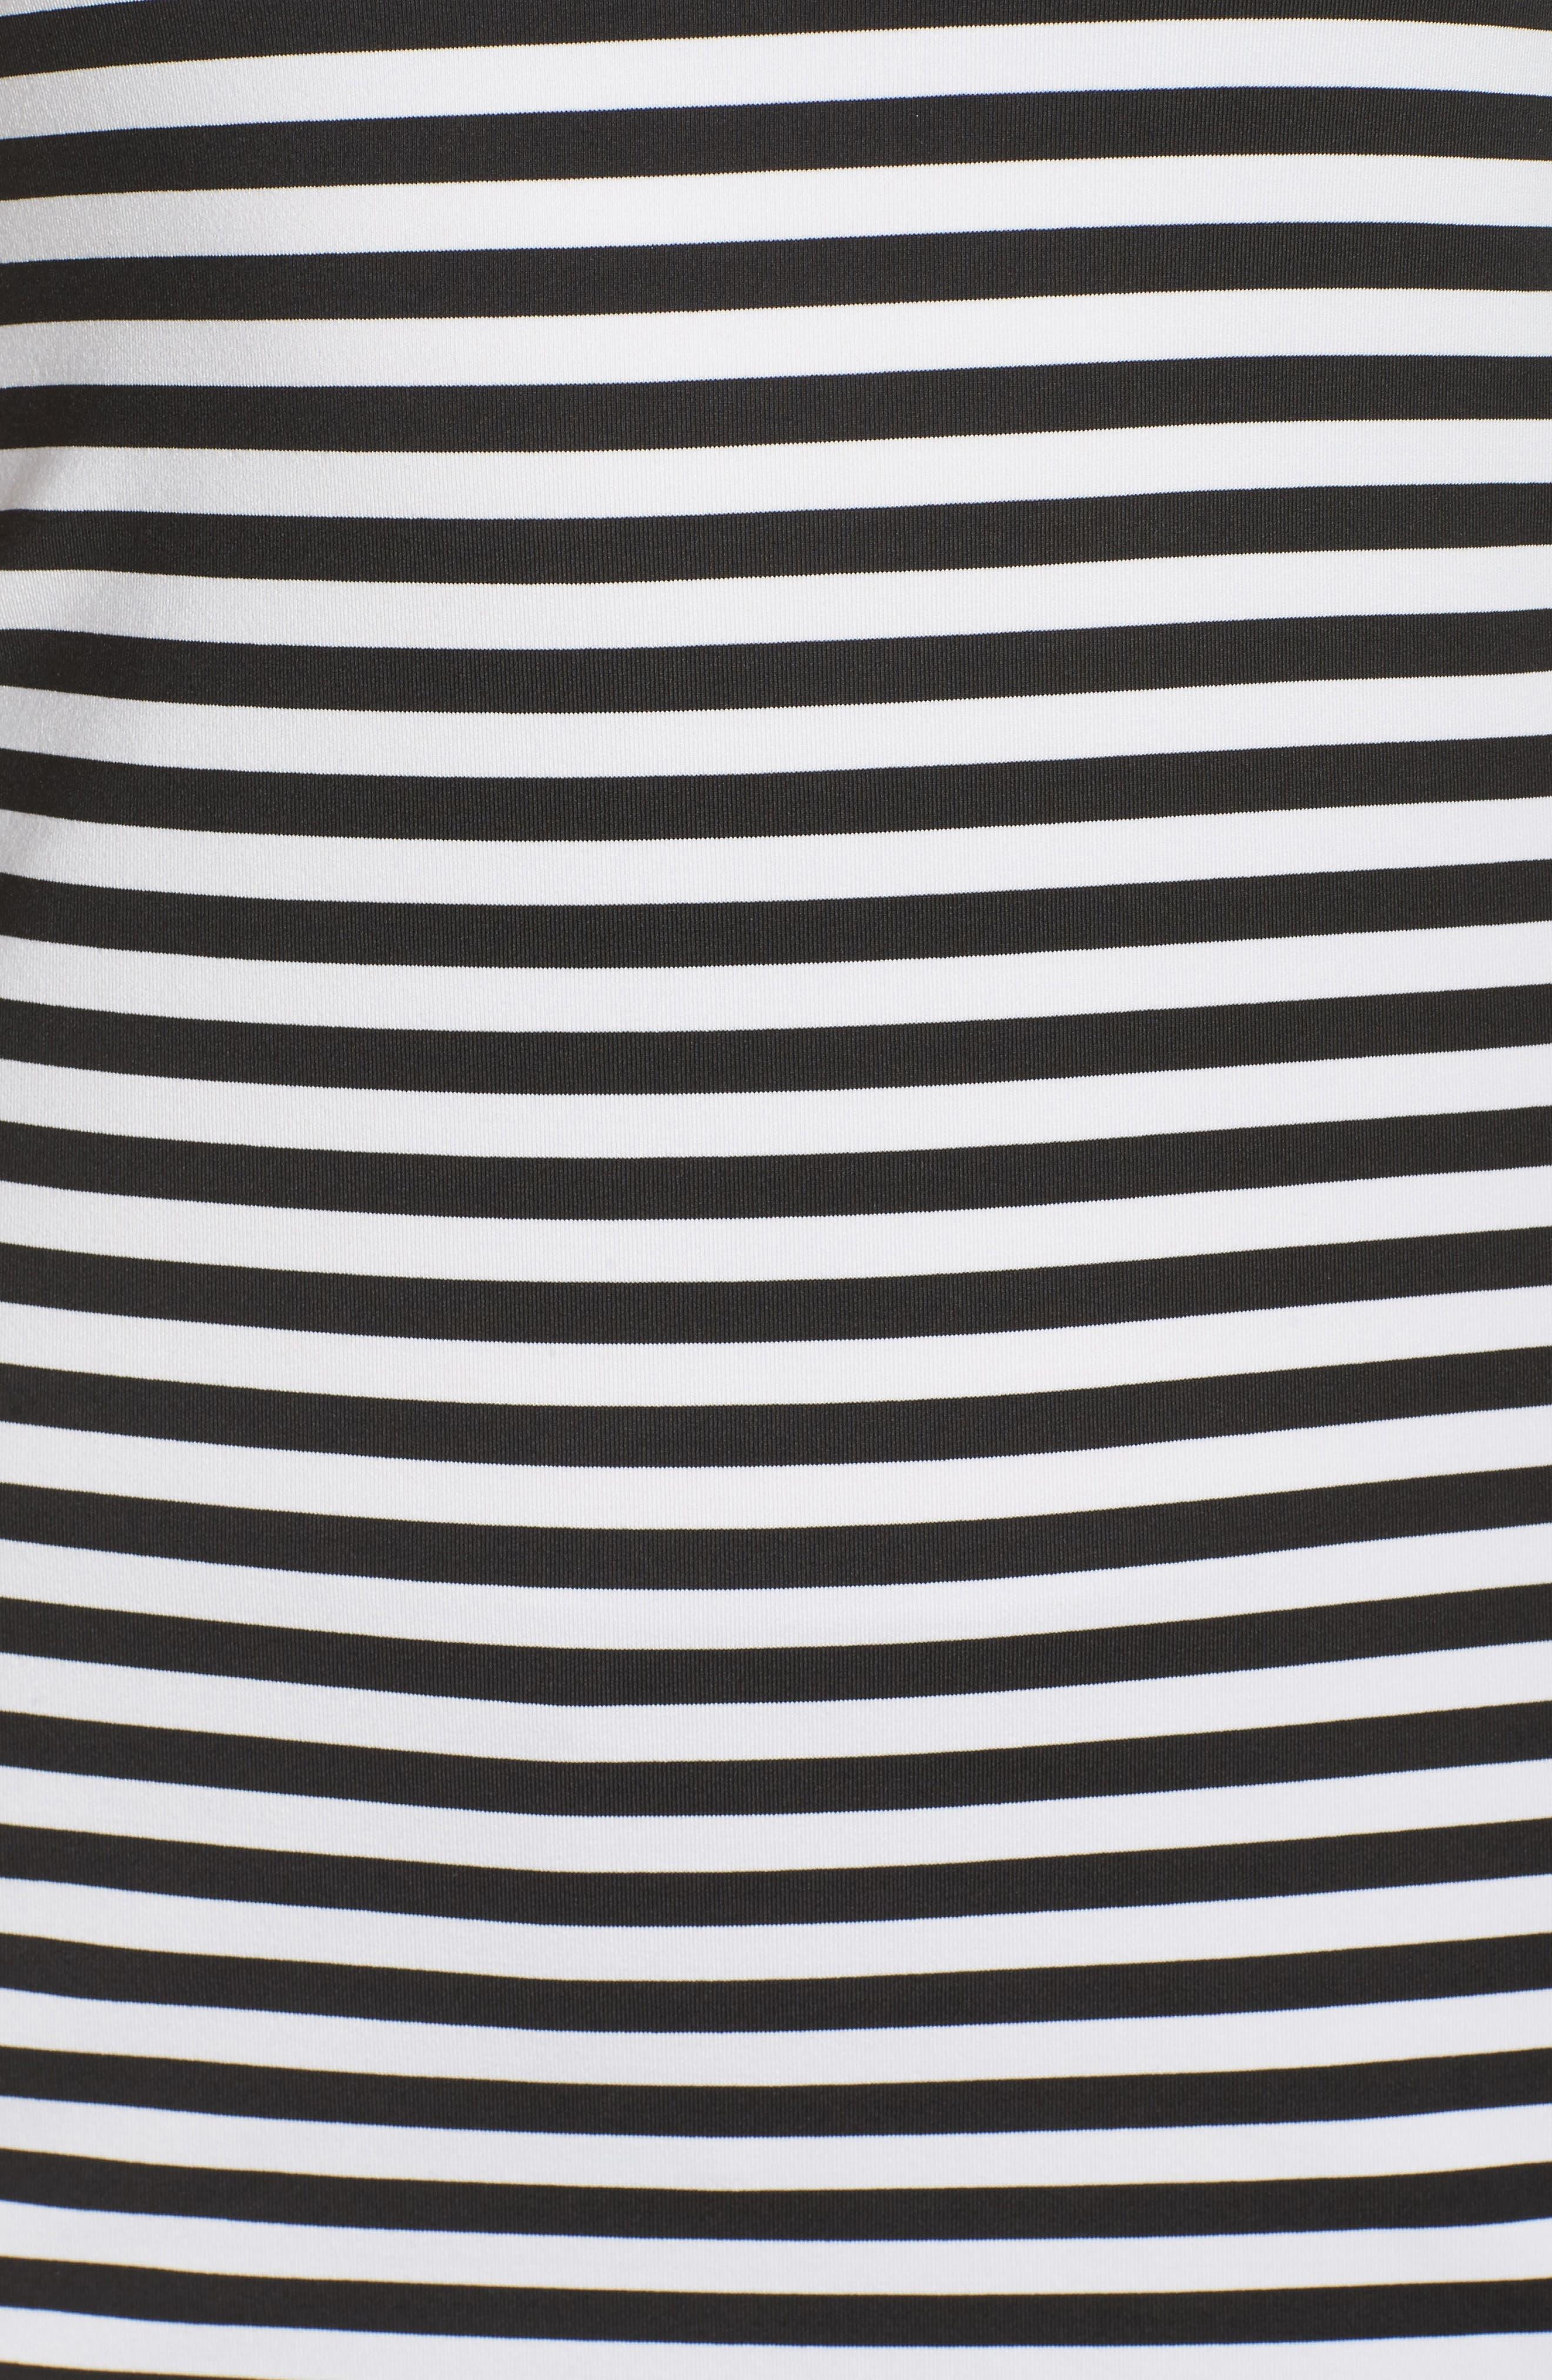 'Go-To' Racerback Tank,                             Alternate thumbnail 6, color,                             White/ Black Stripe/ White